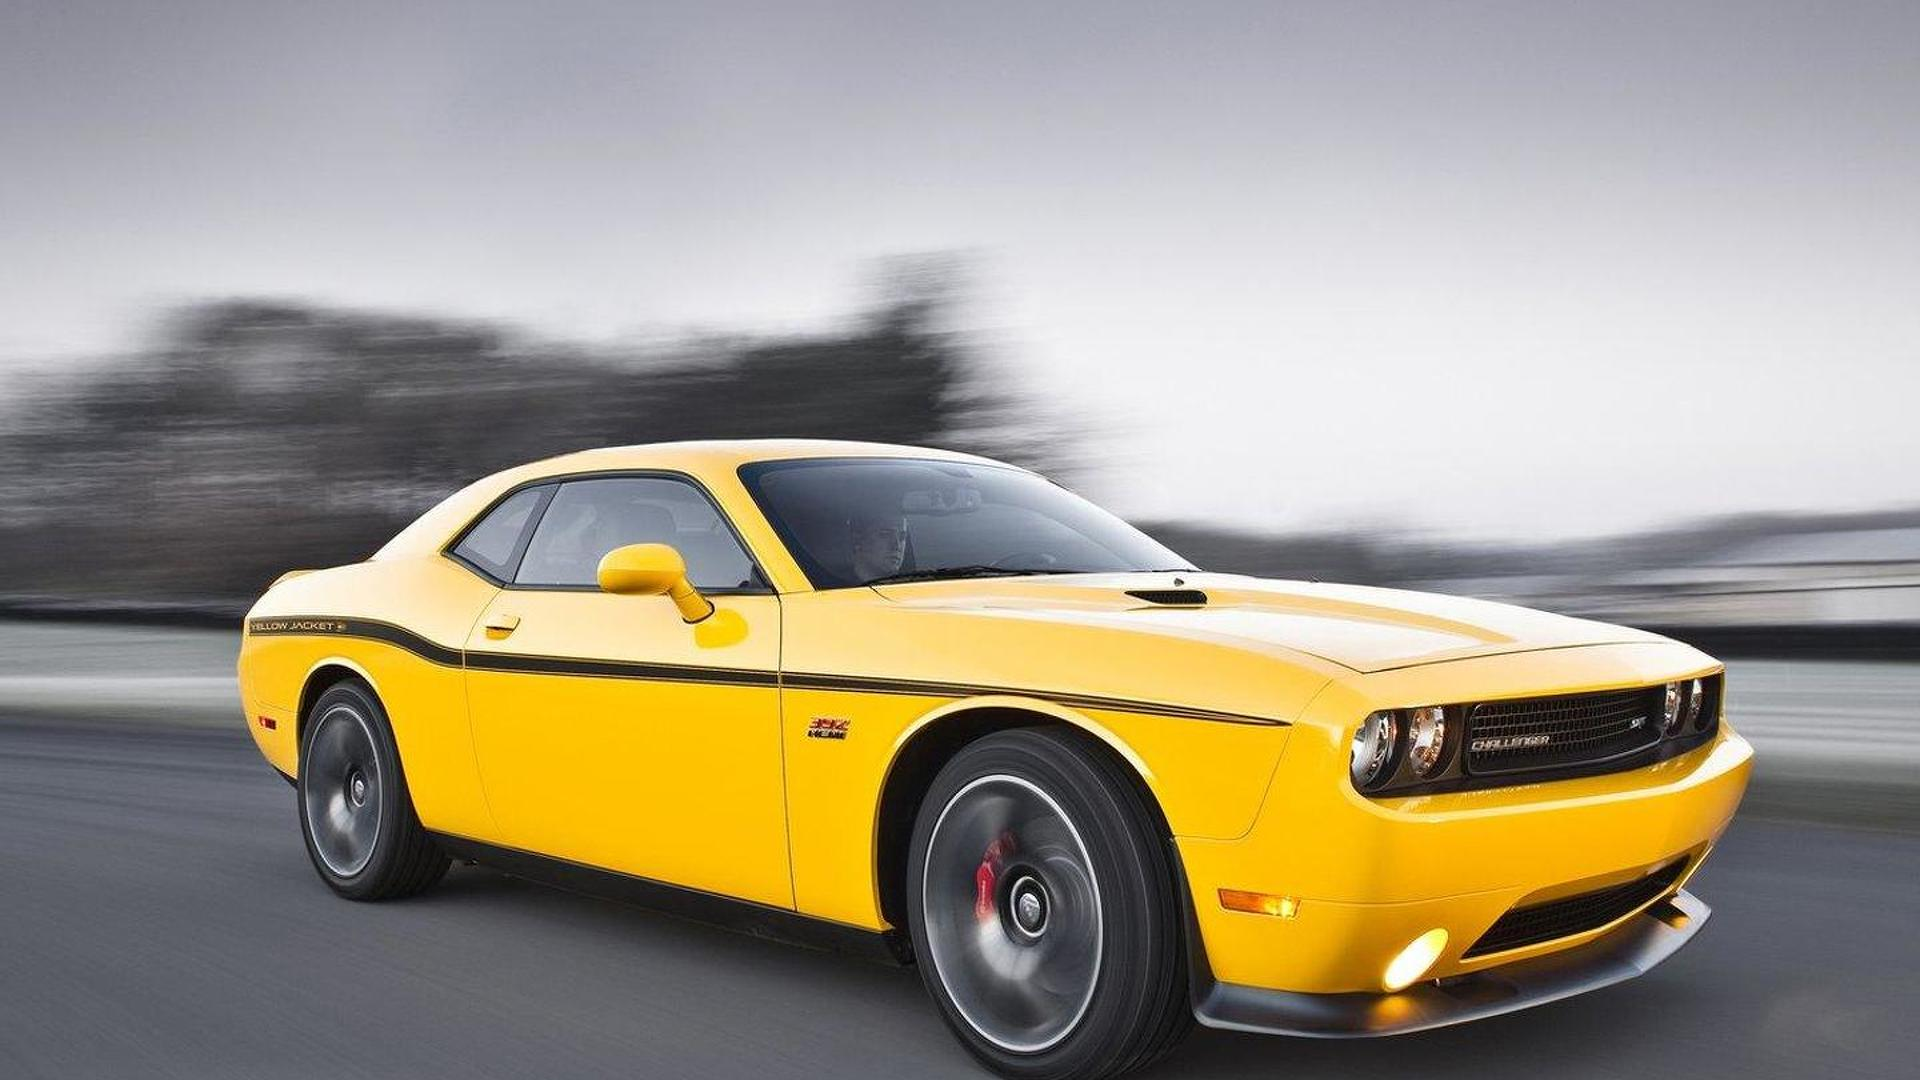 SRT Barracuda to be sold alongside the Dodge Challenger - report